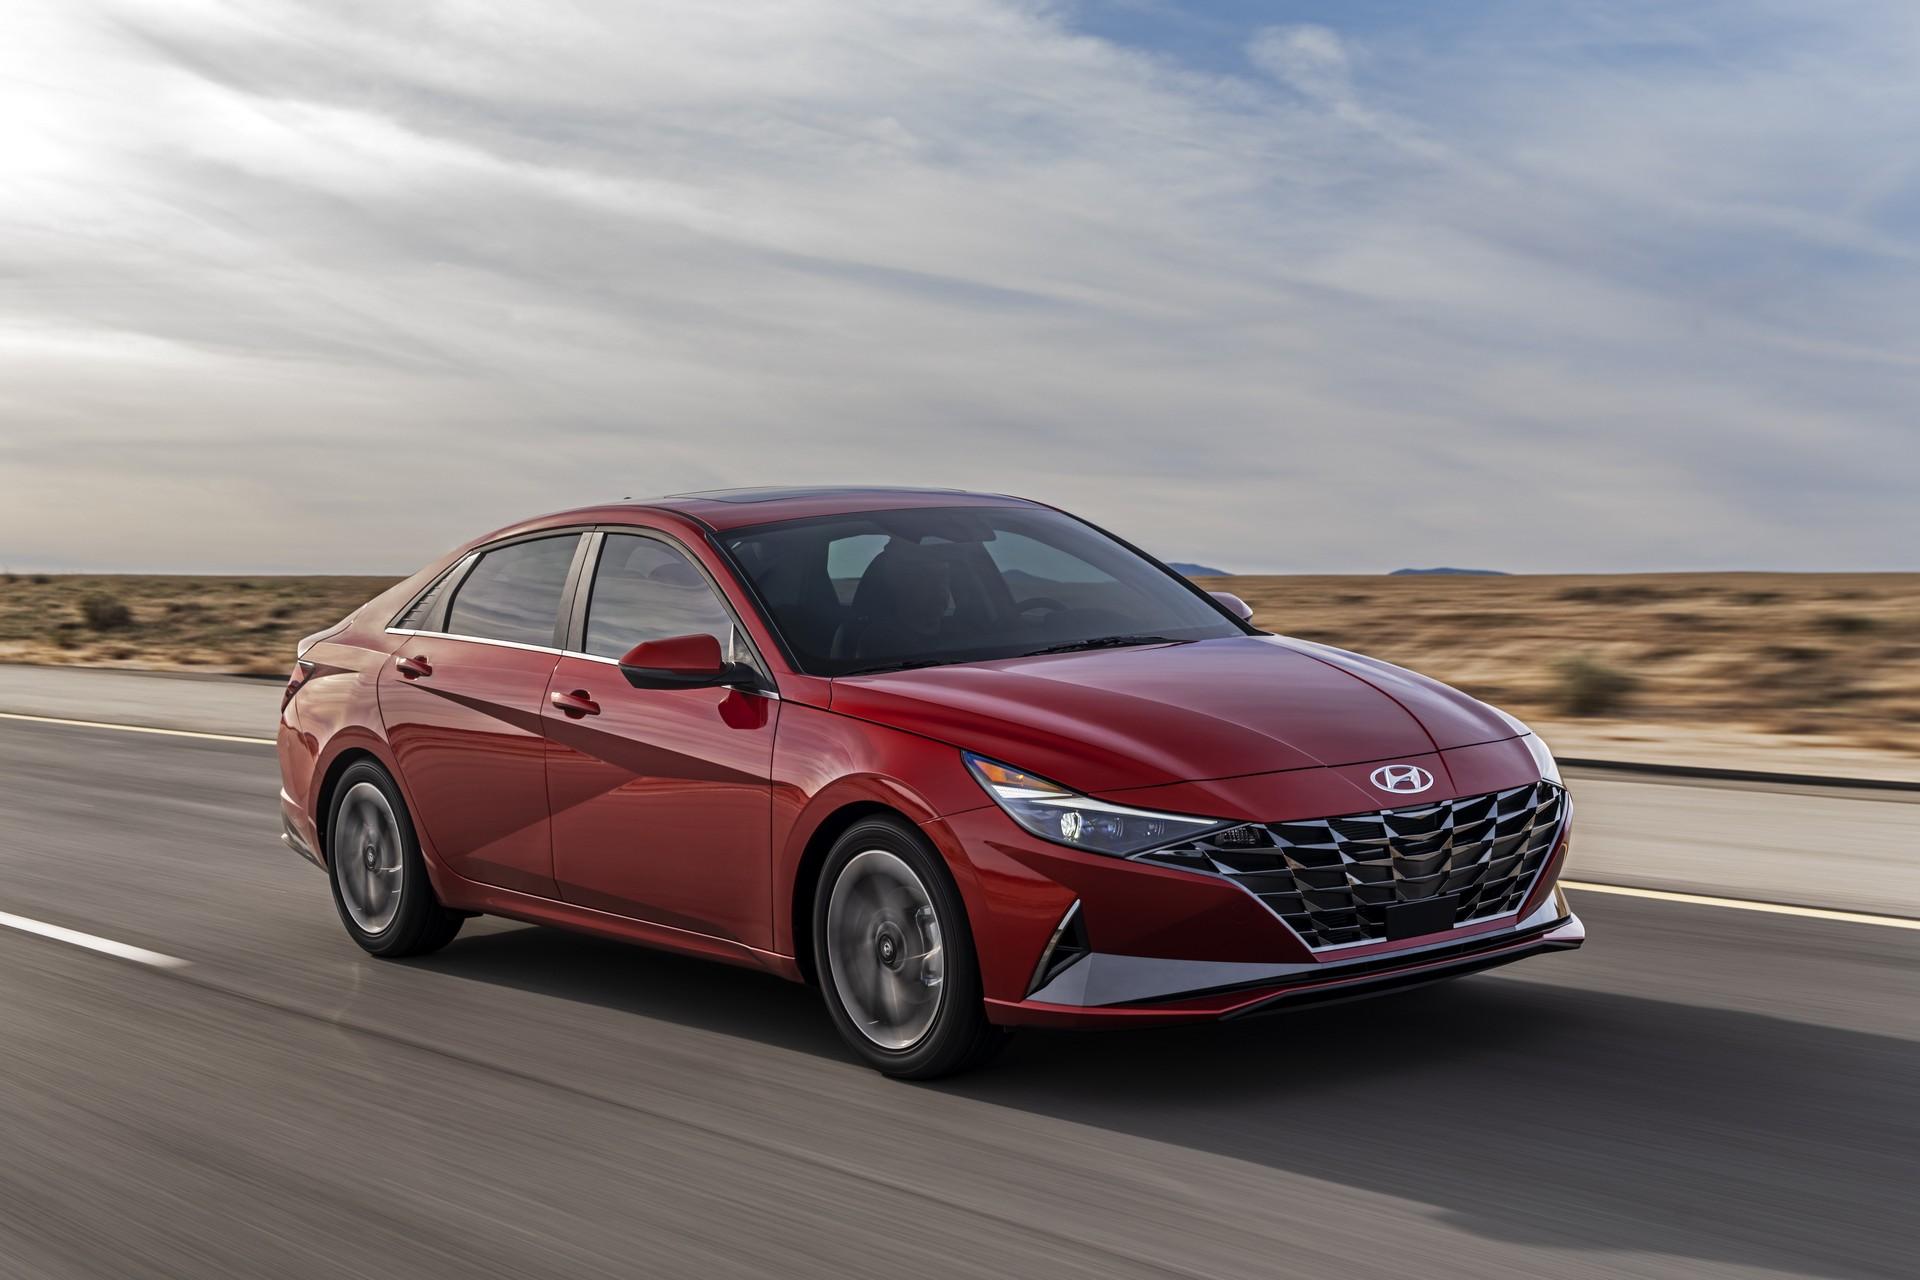 Hyundai Elantra 2021 chốt giá từ 19.650 USD, bản N Line có giá từ 24.100 USD